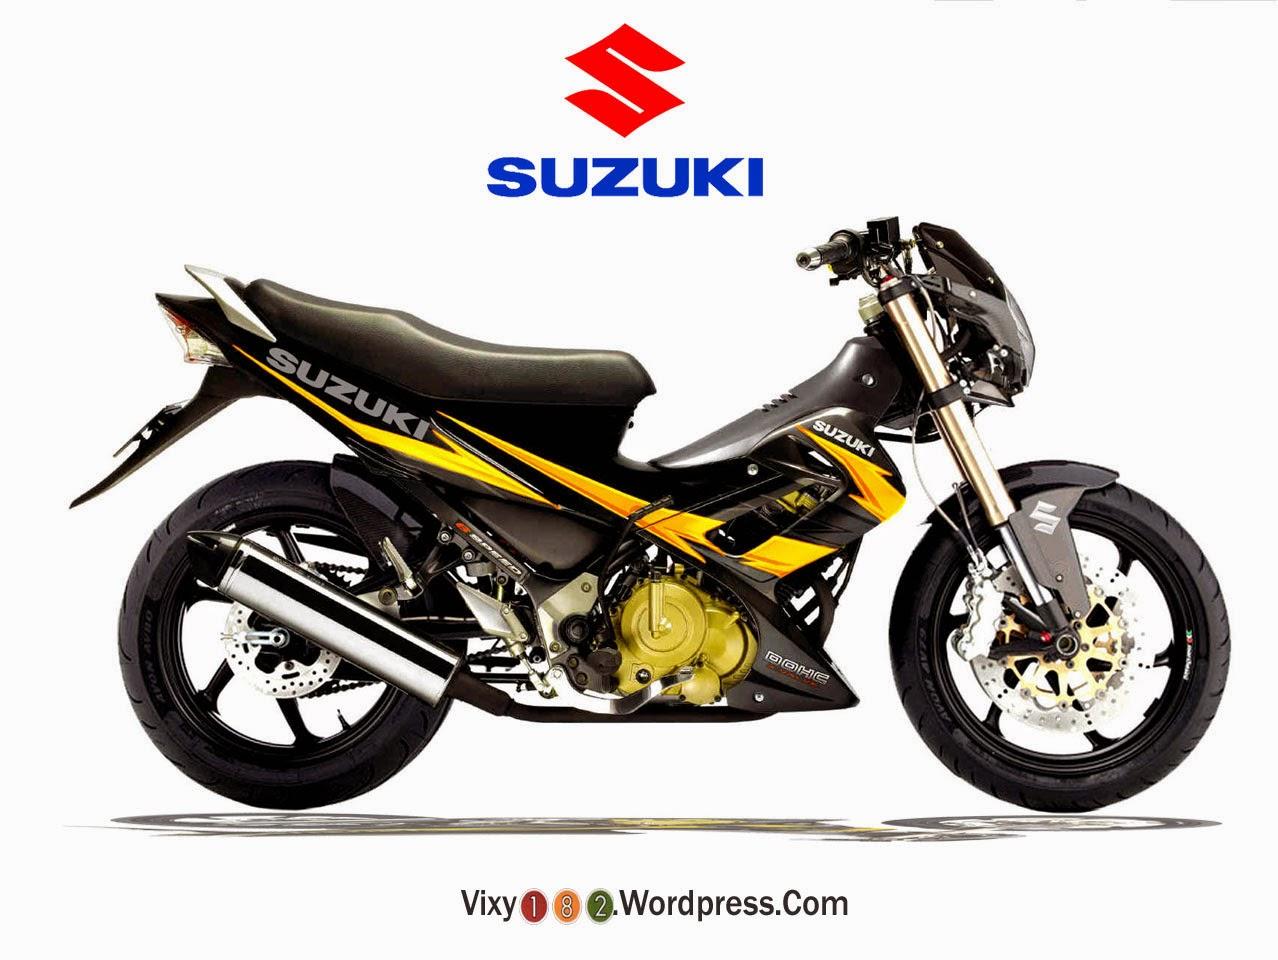 Suzuki Satria Fu 150 Modifikasi Trail - Thecitycyclist